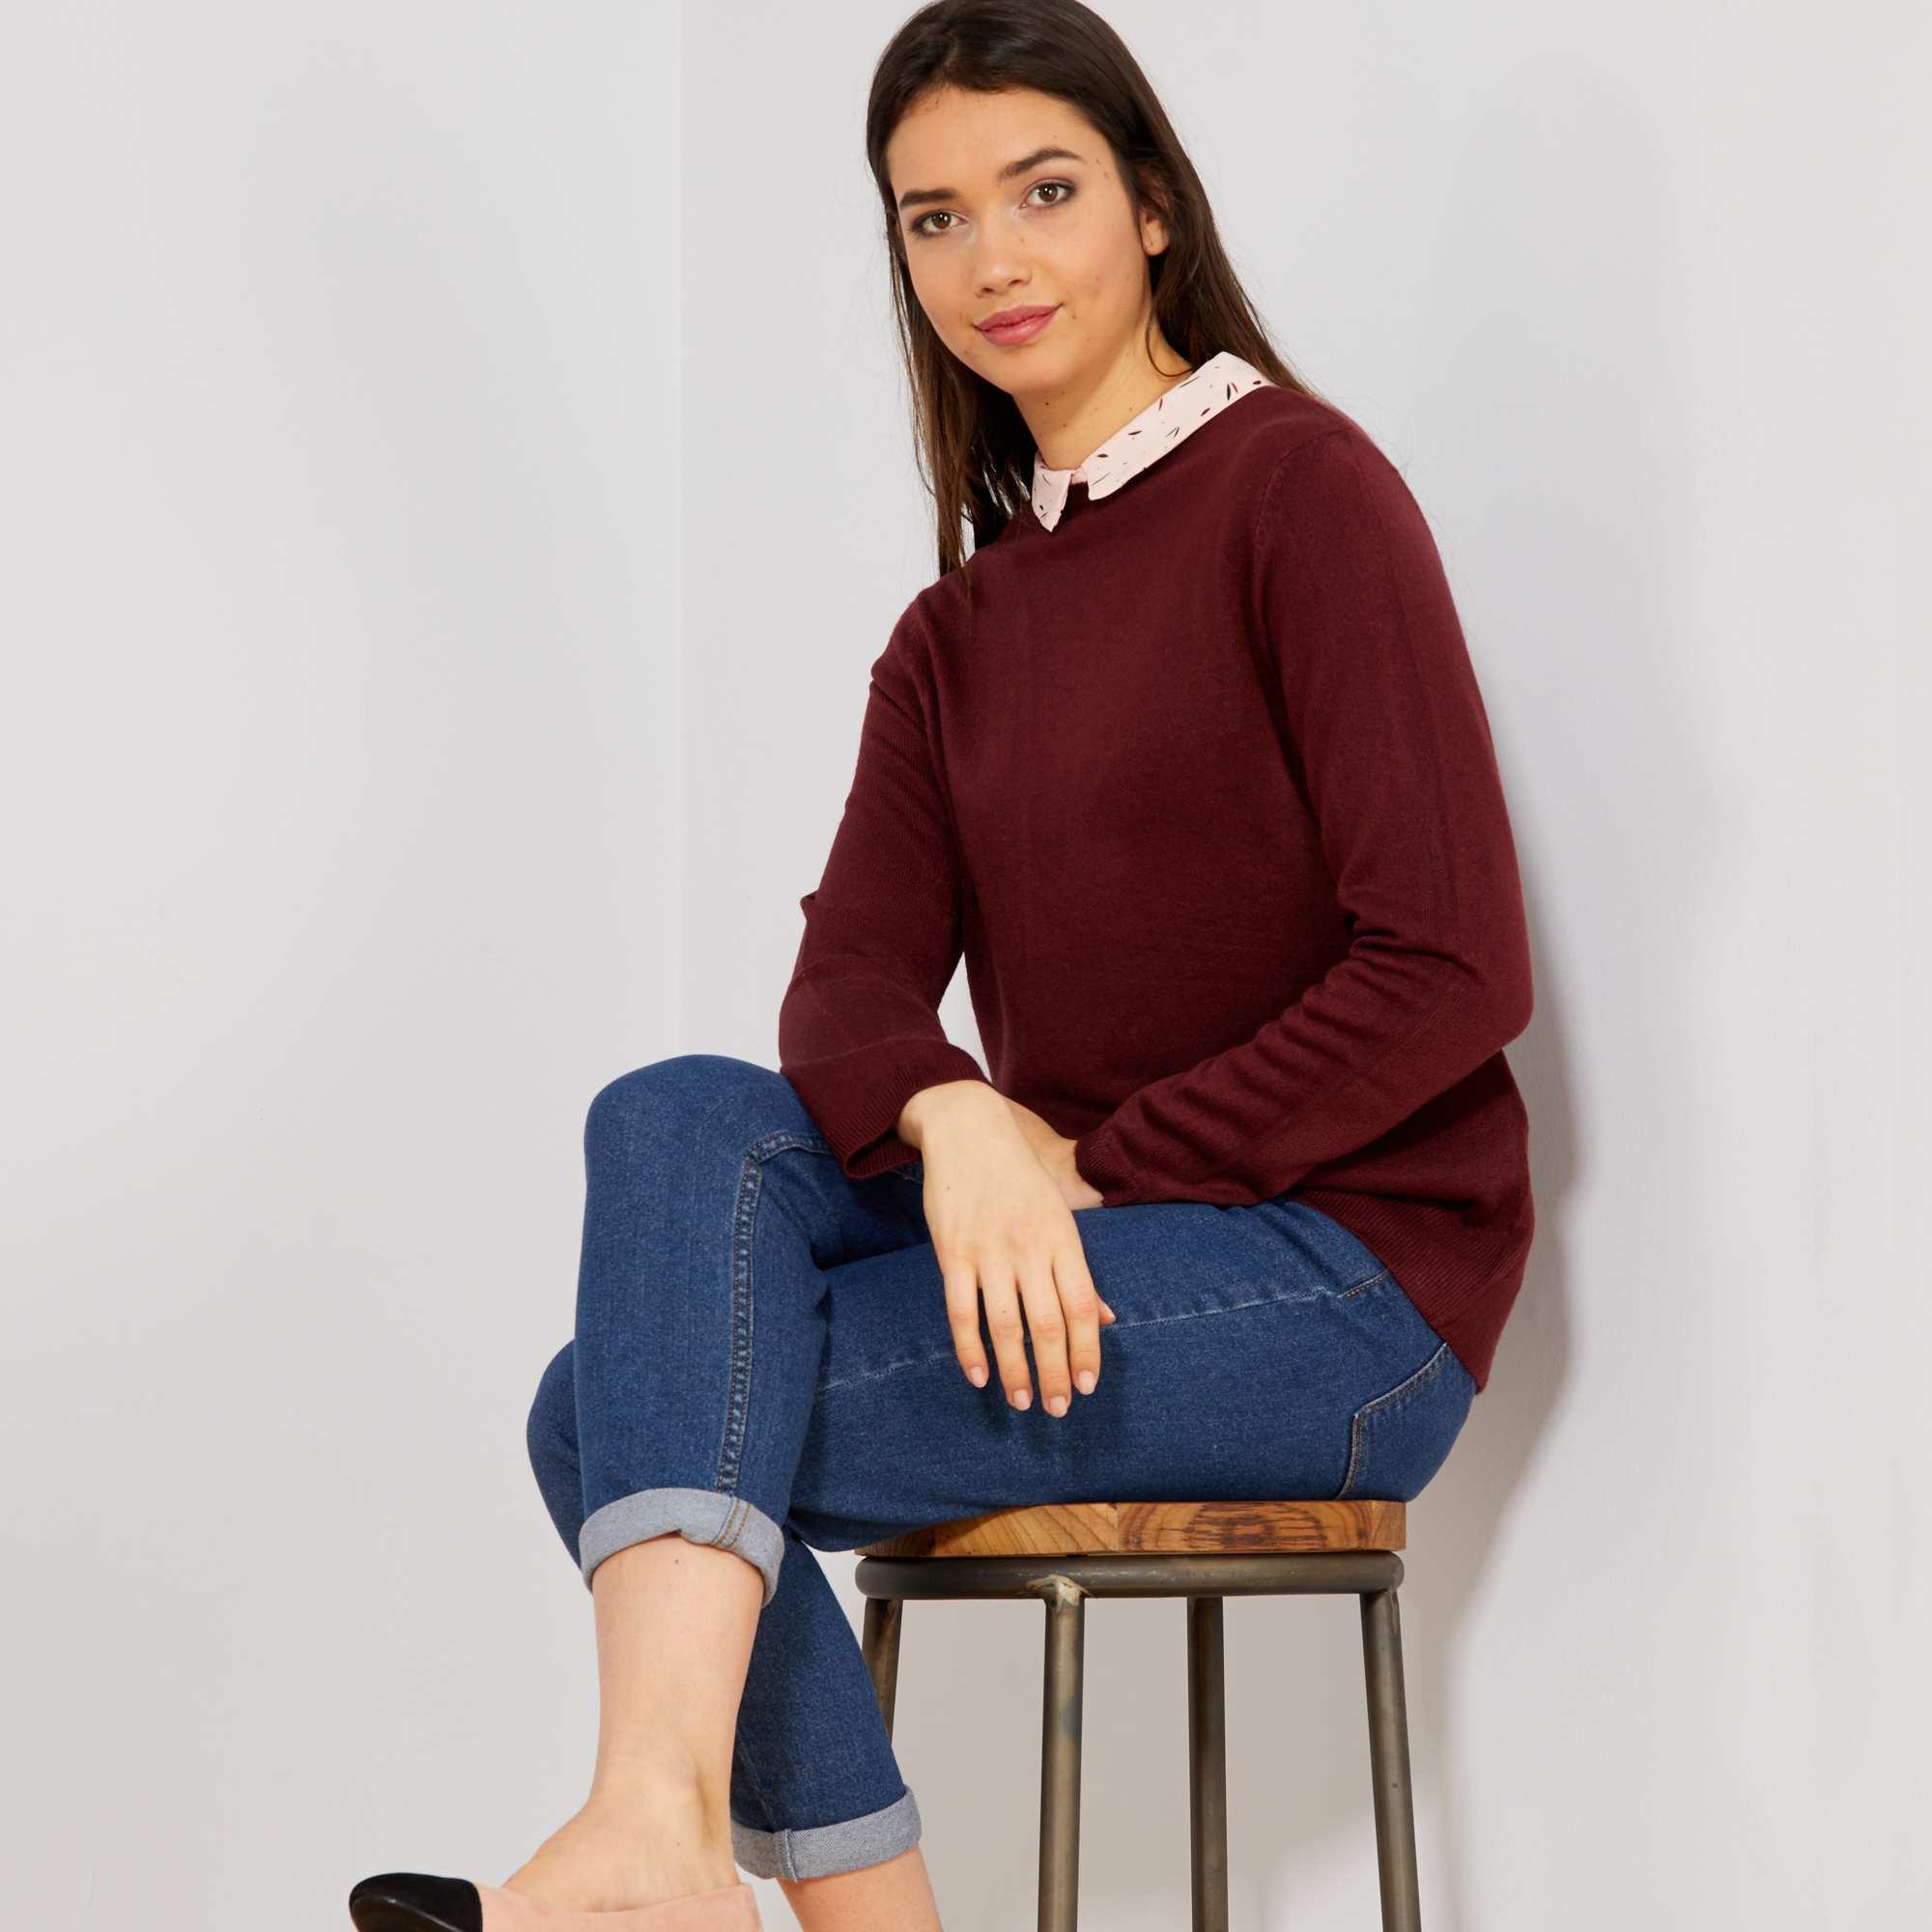 d8add5c0325 Pull col chemise Femme - bordeaux - Kiabi - 12